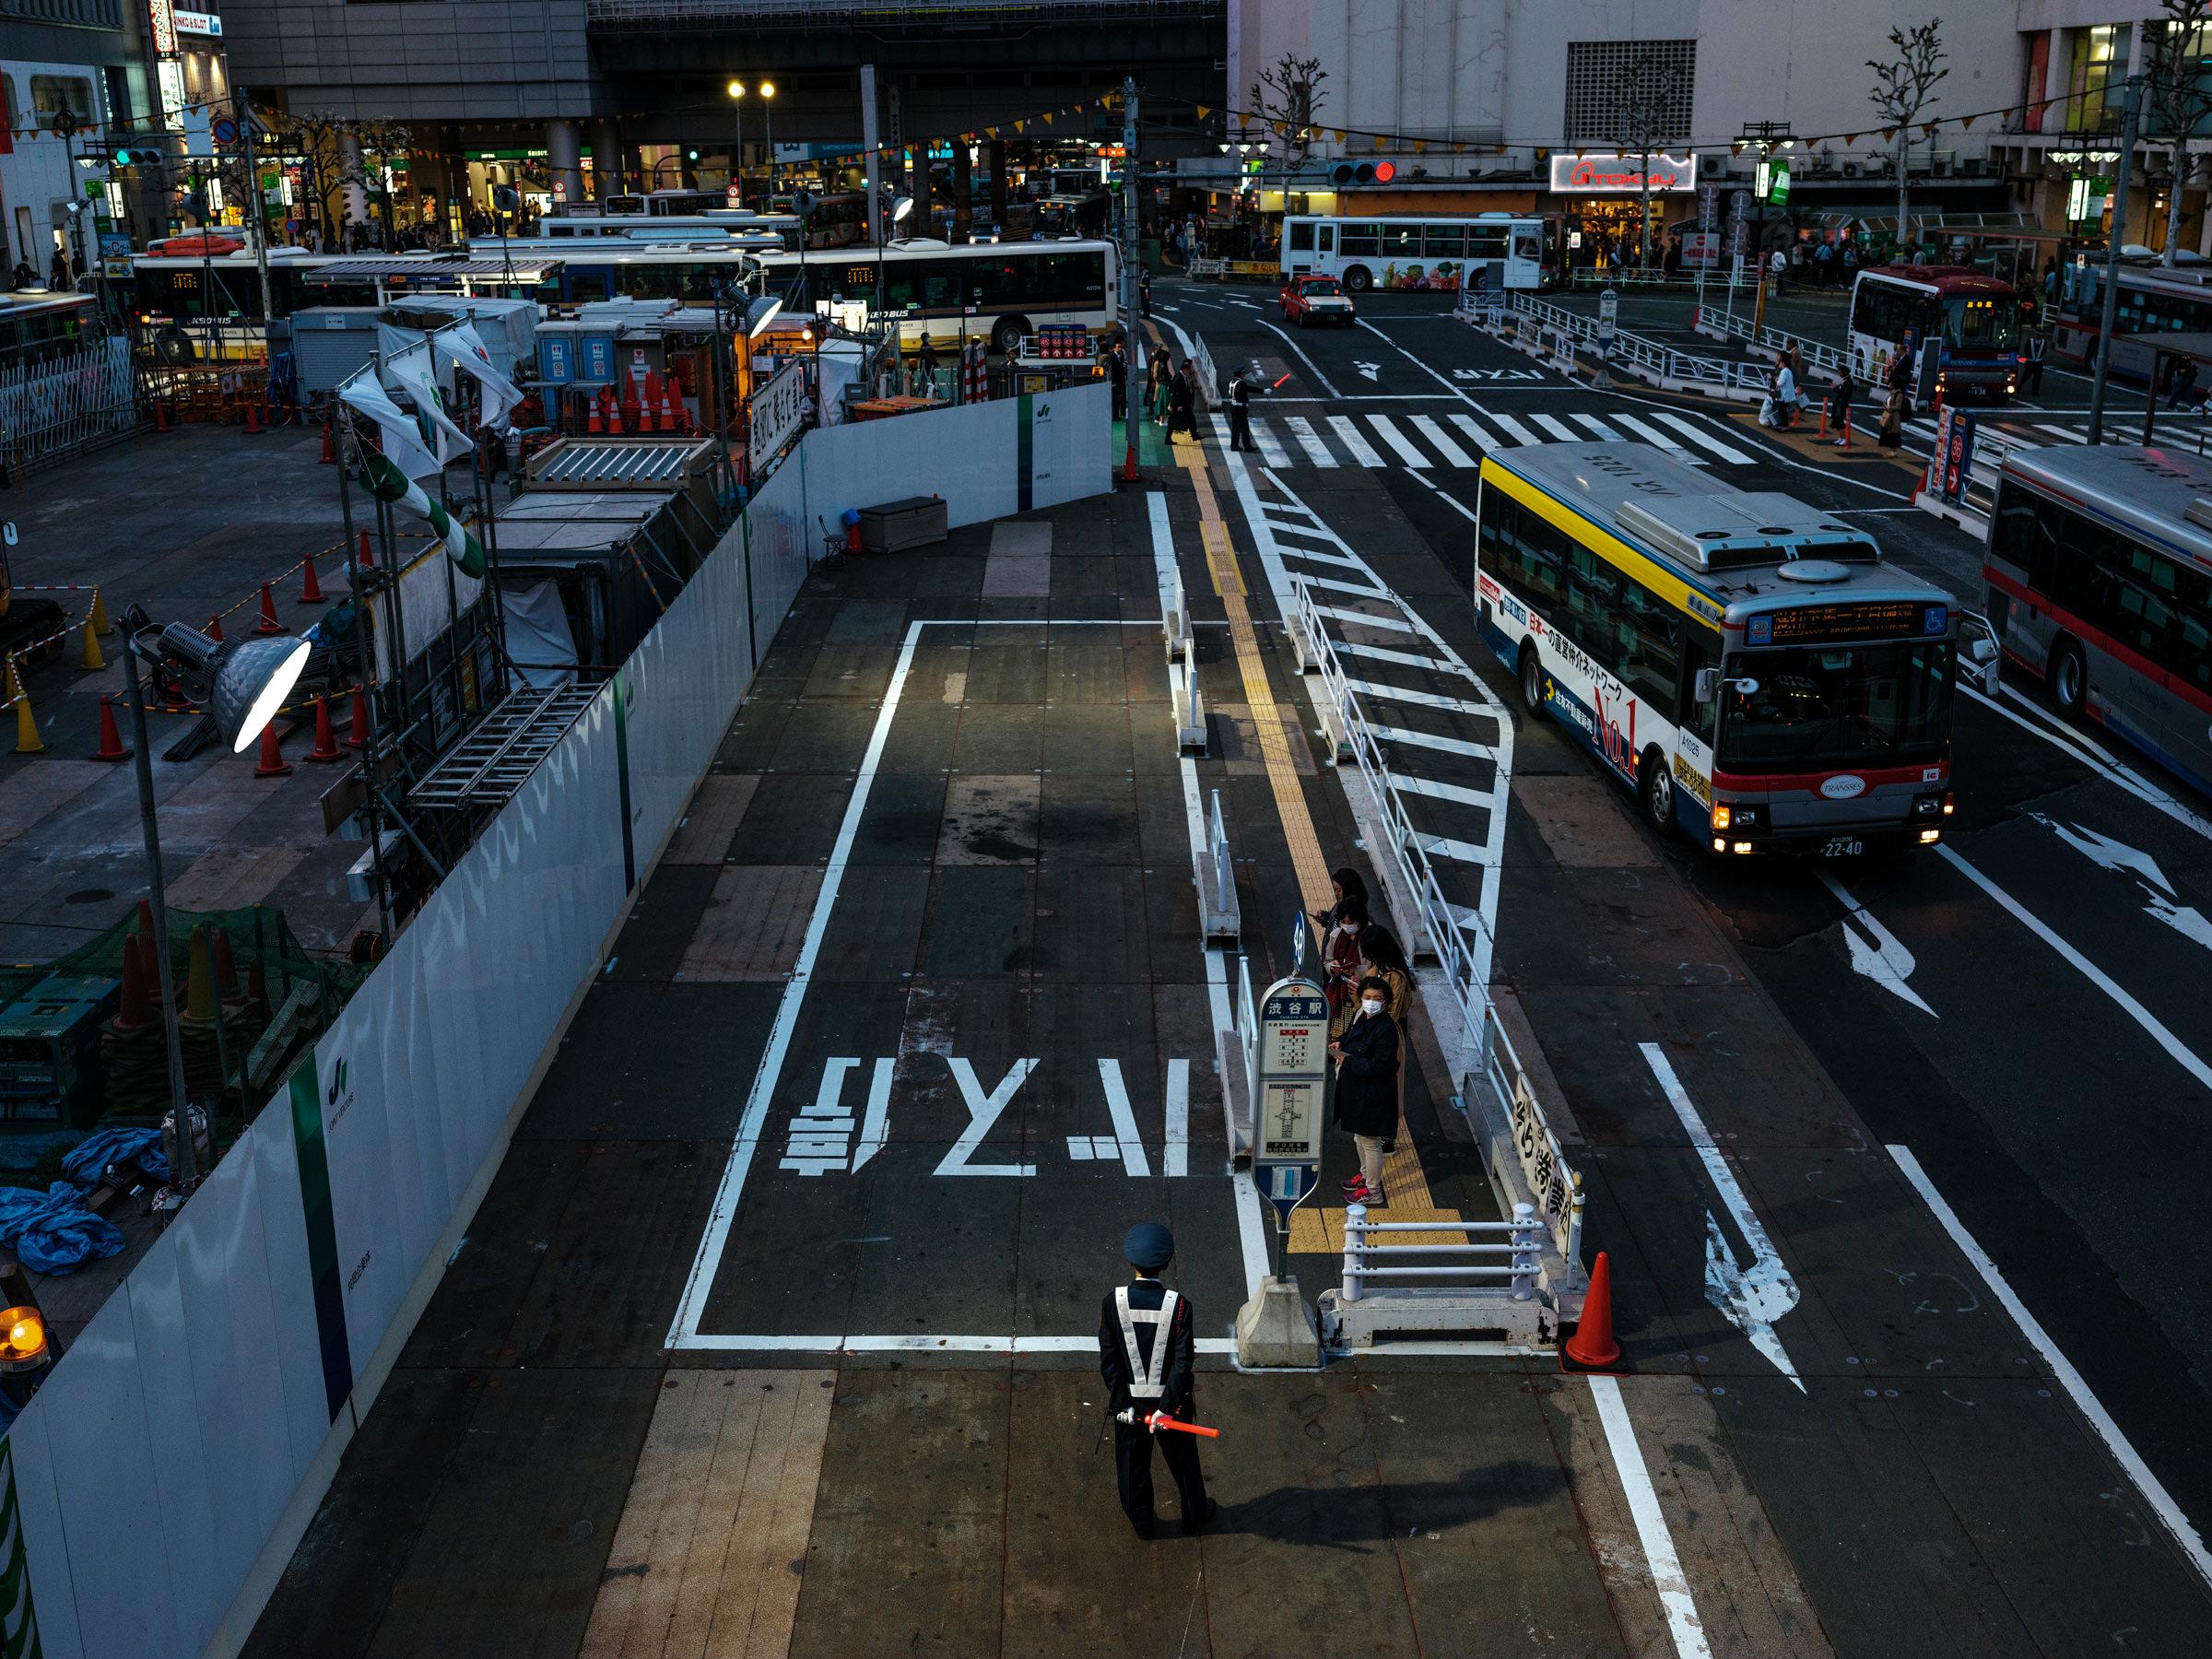 Fujifilm-GFX-Japan-Street-Photography-40